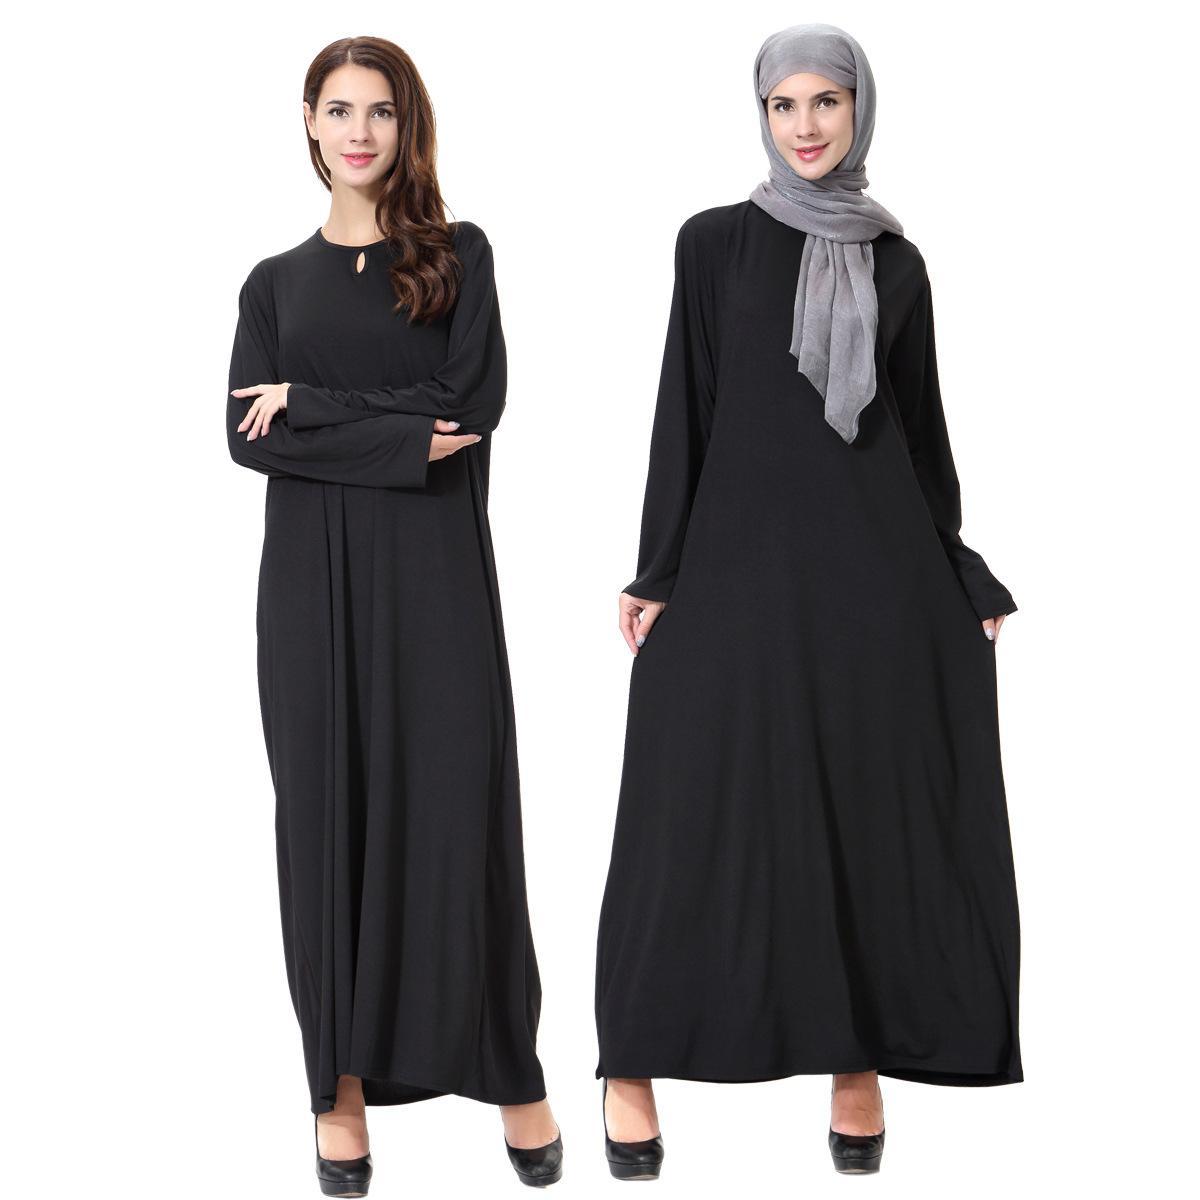 Ladies Dresses For Muslim Women